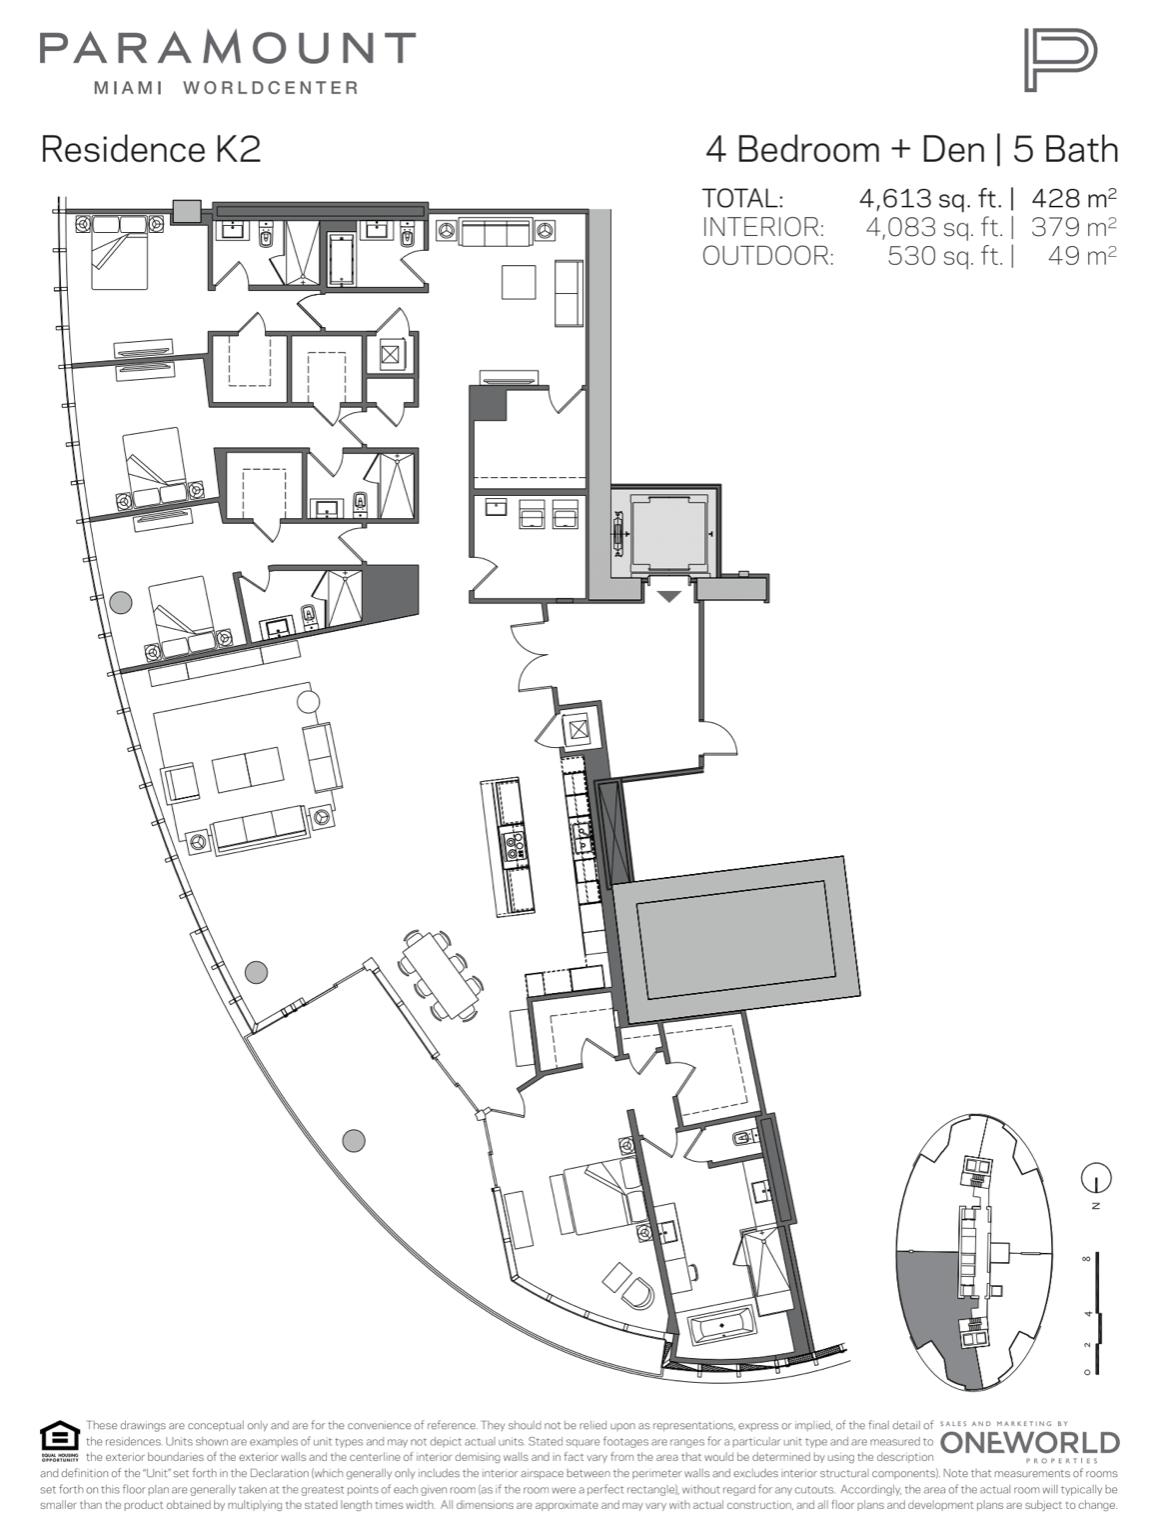 PMWC Penthouse K2